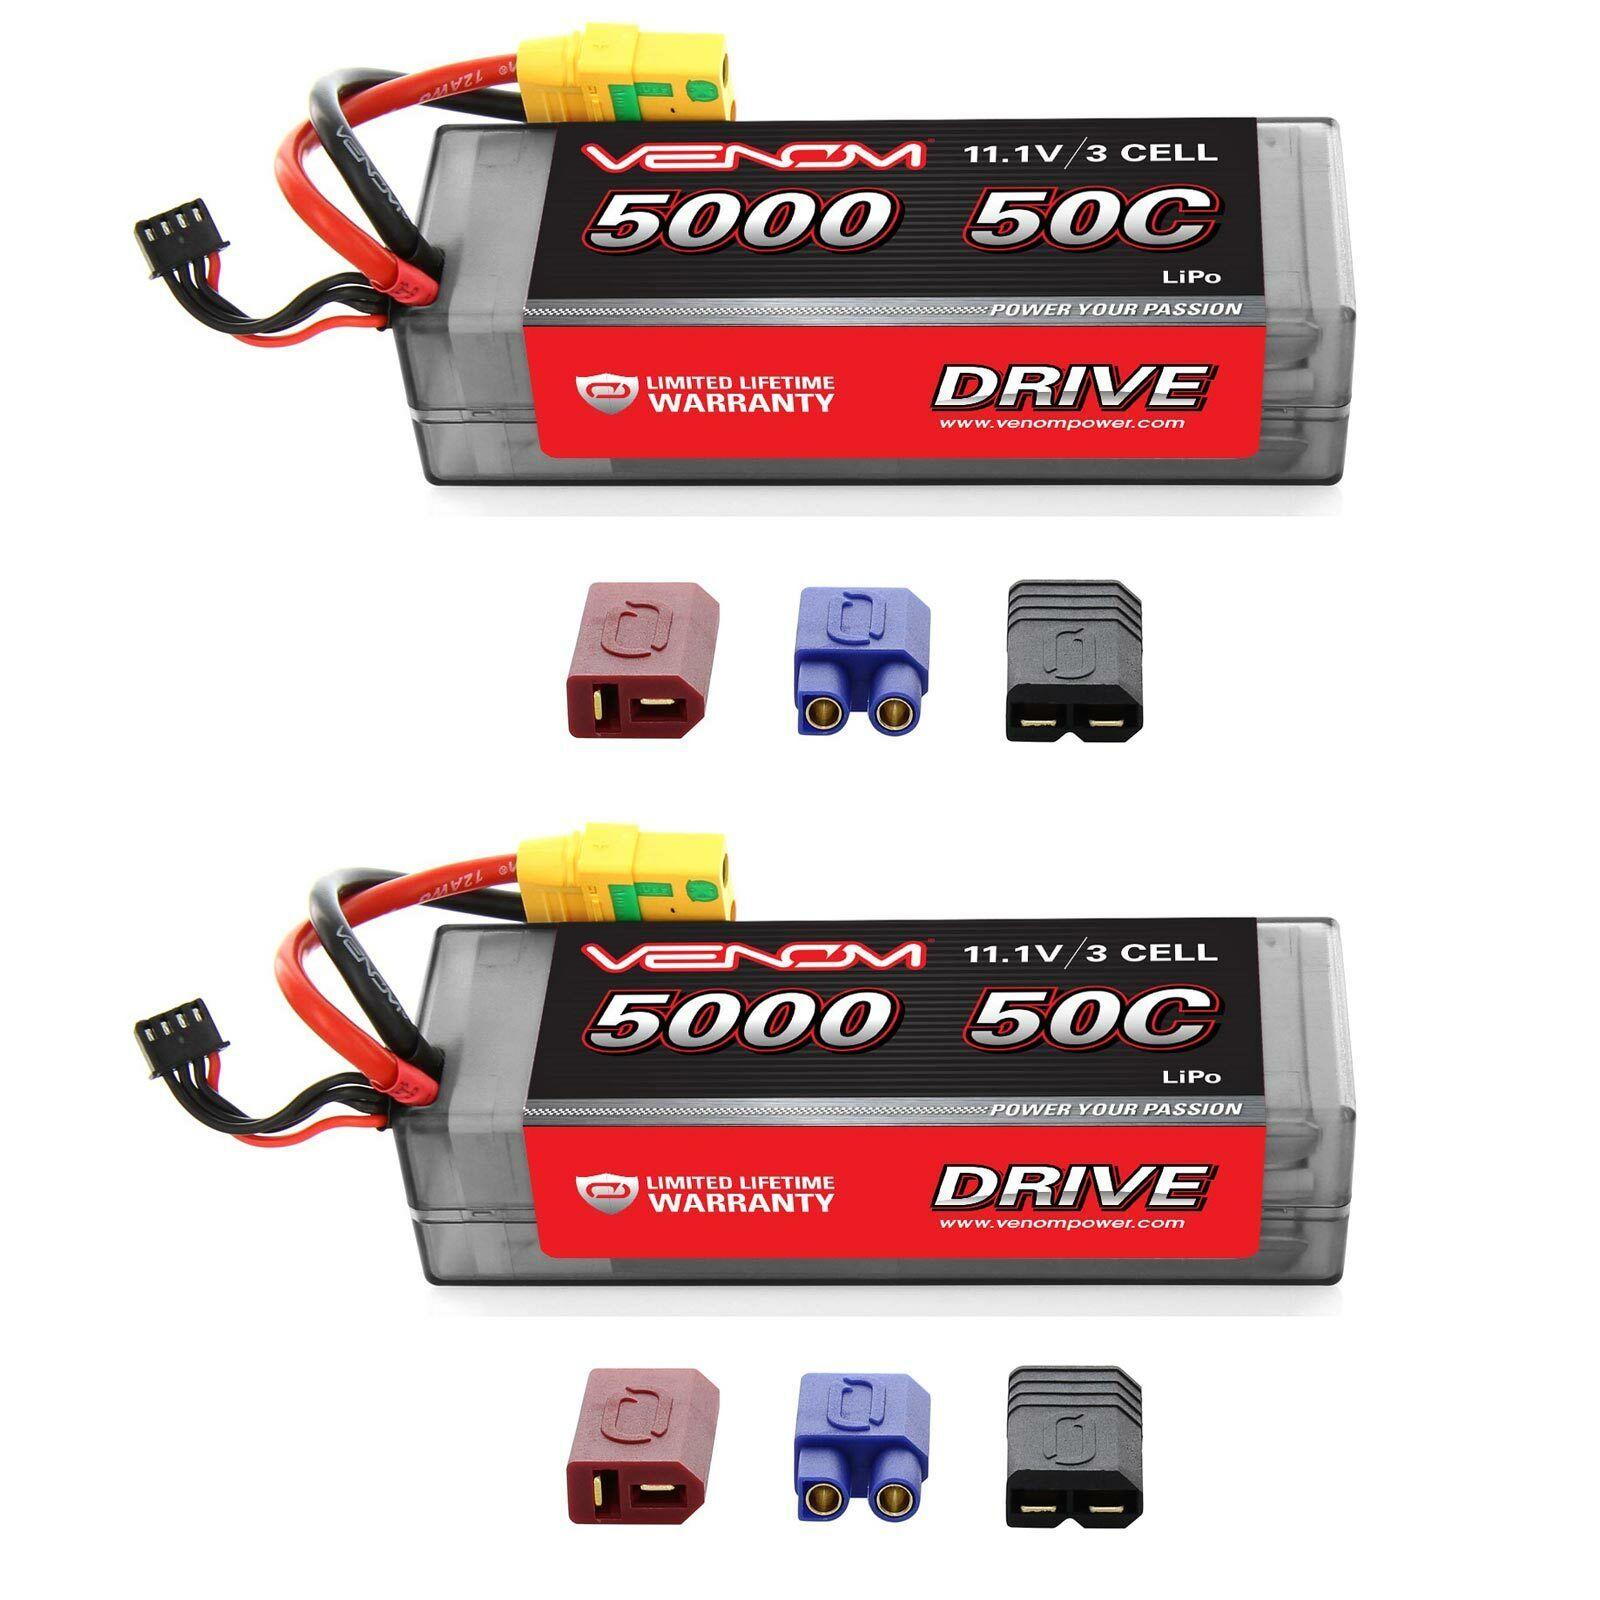 Venom 50C 3S 5000mAh 11.1 Batería LiPo Hardcase con Enchufe XT90-S x2 paquetes